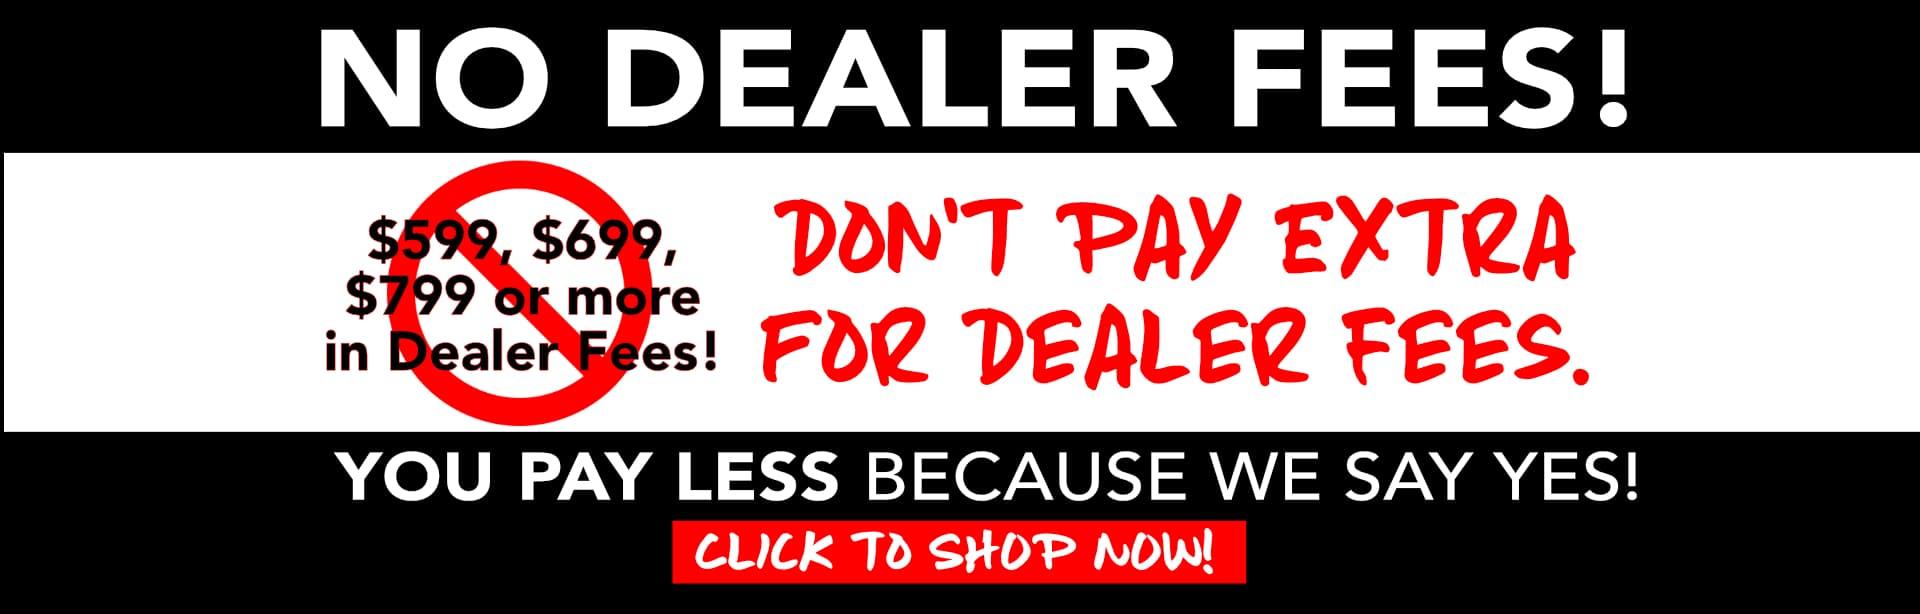 Jim Ellis Toyota No Dealer Fees